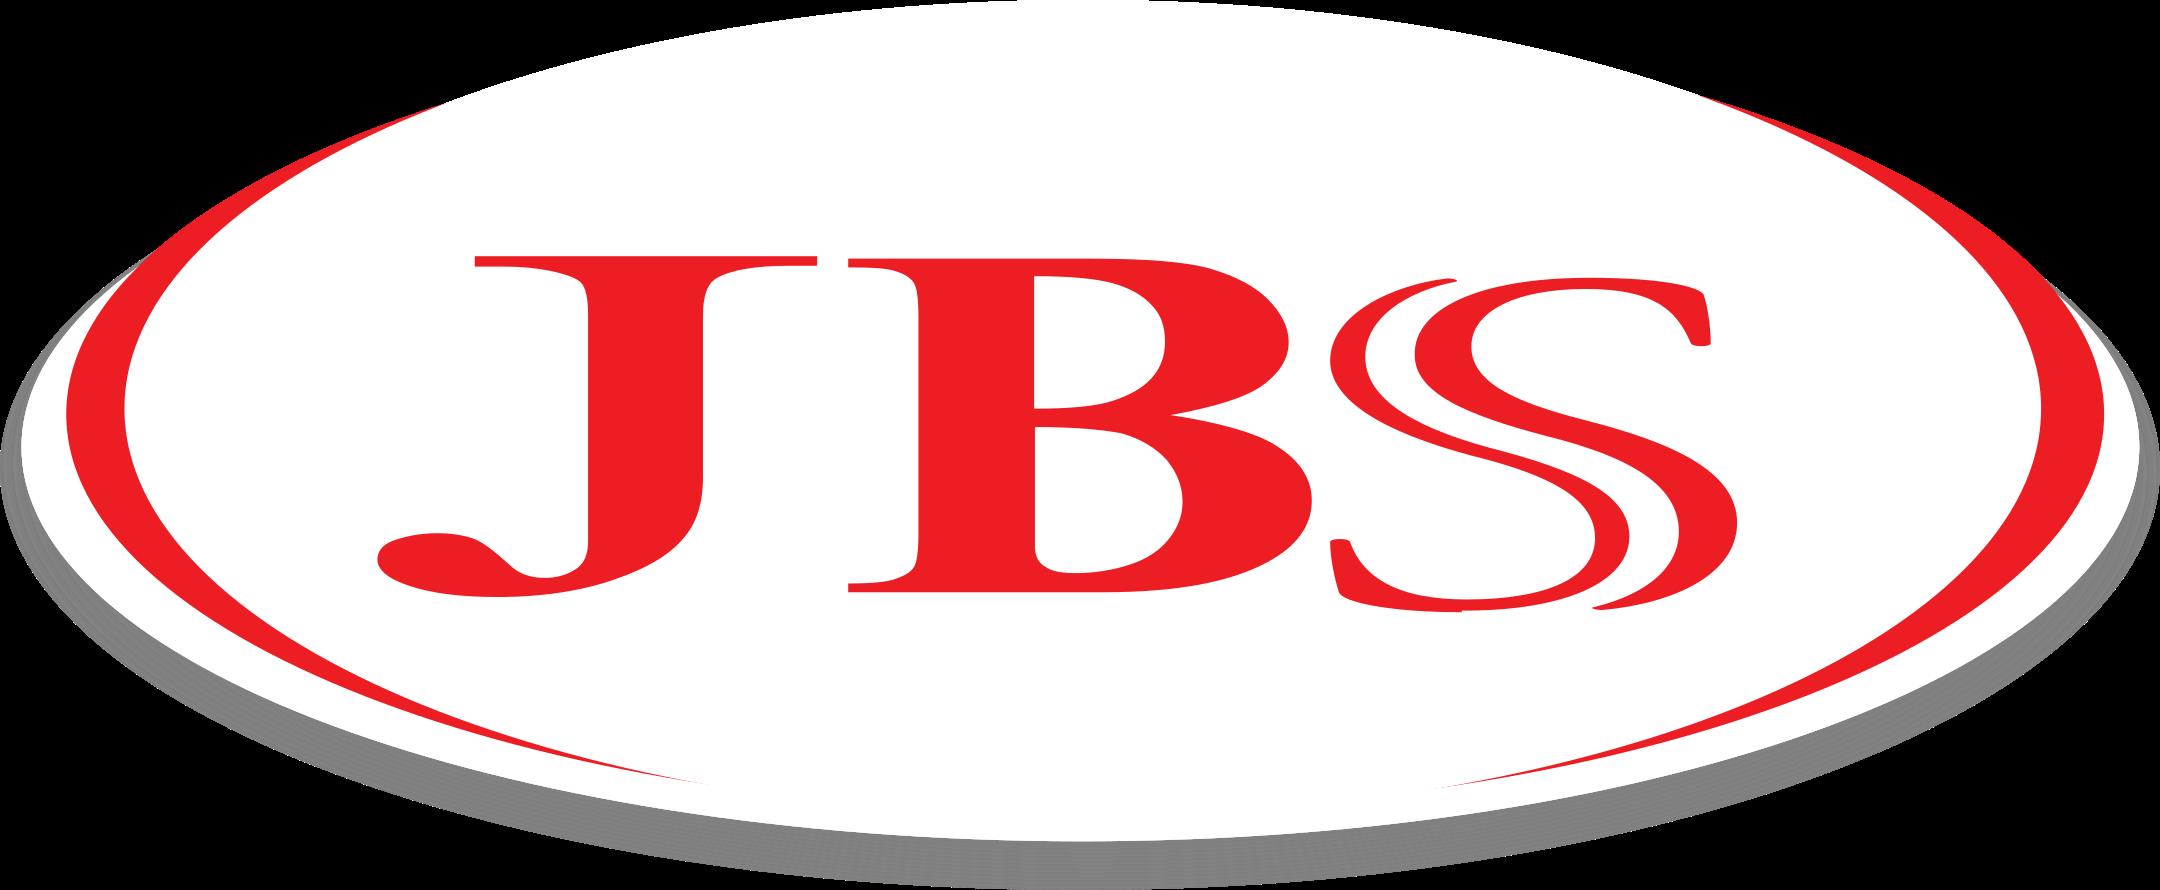 jbs logo 1 - JBS Foods Logo